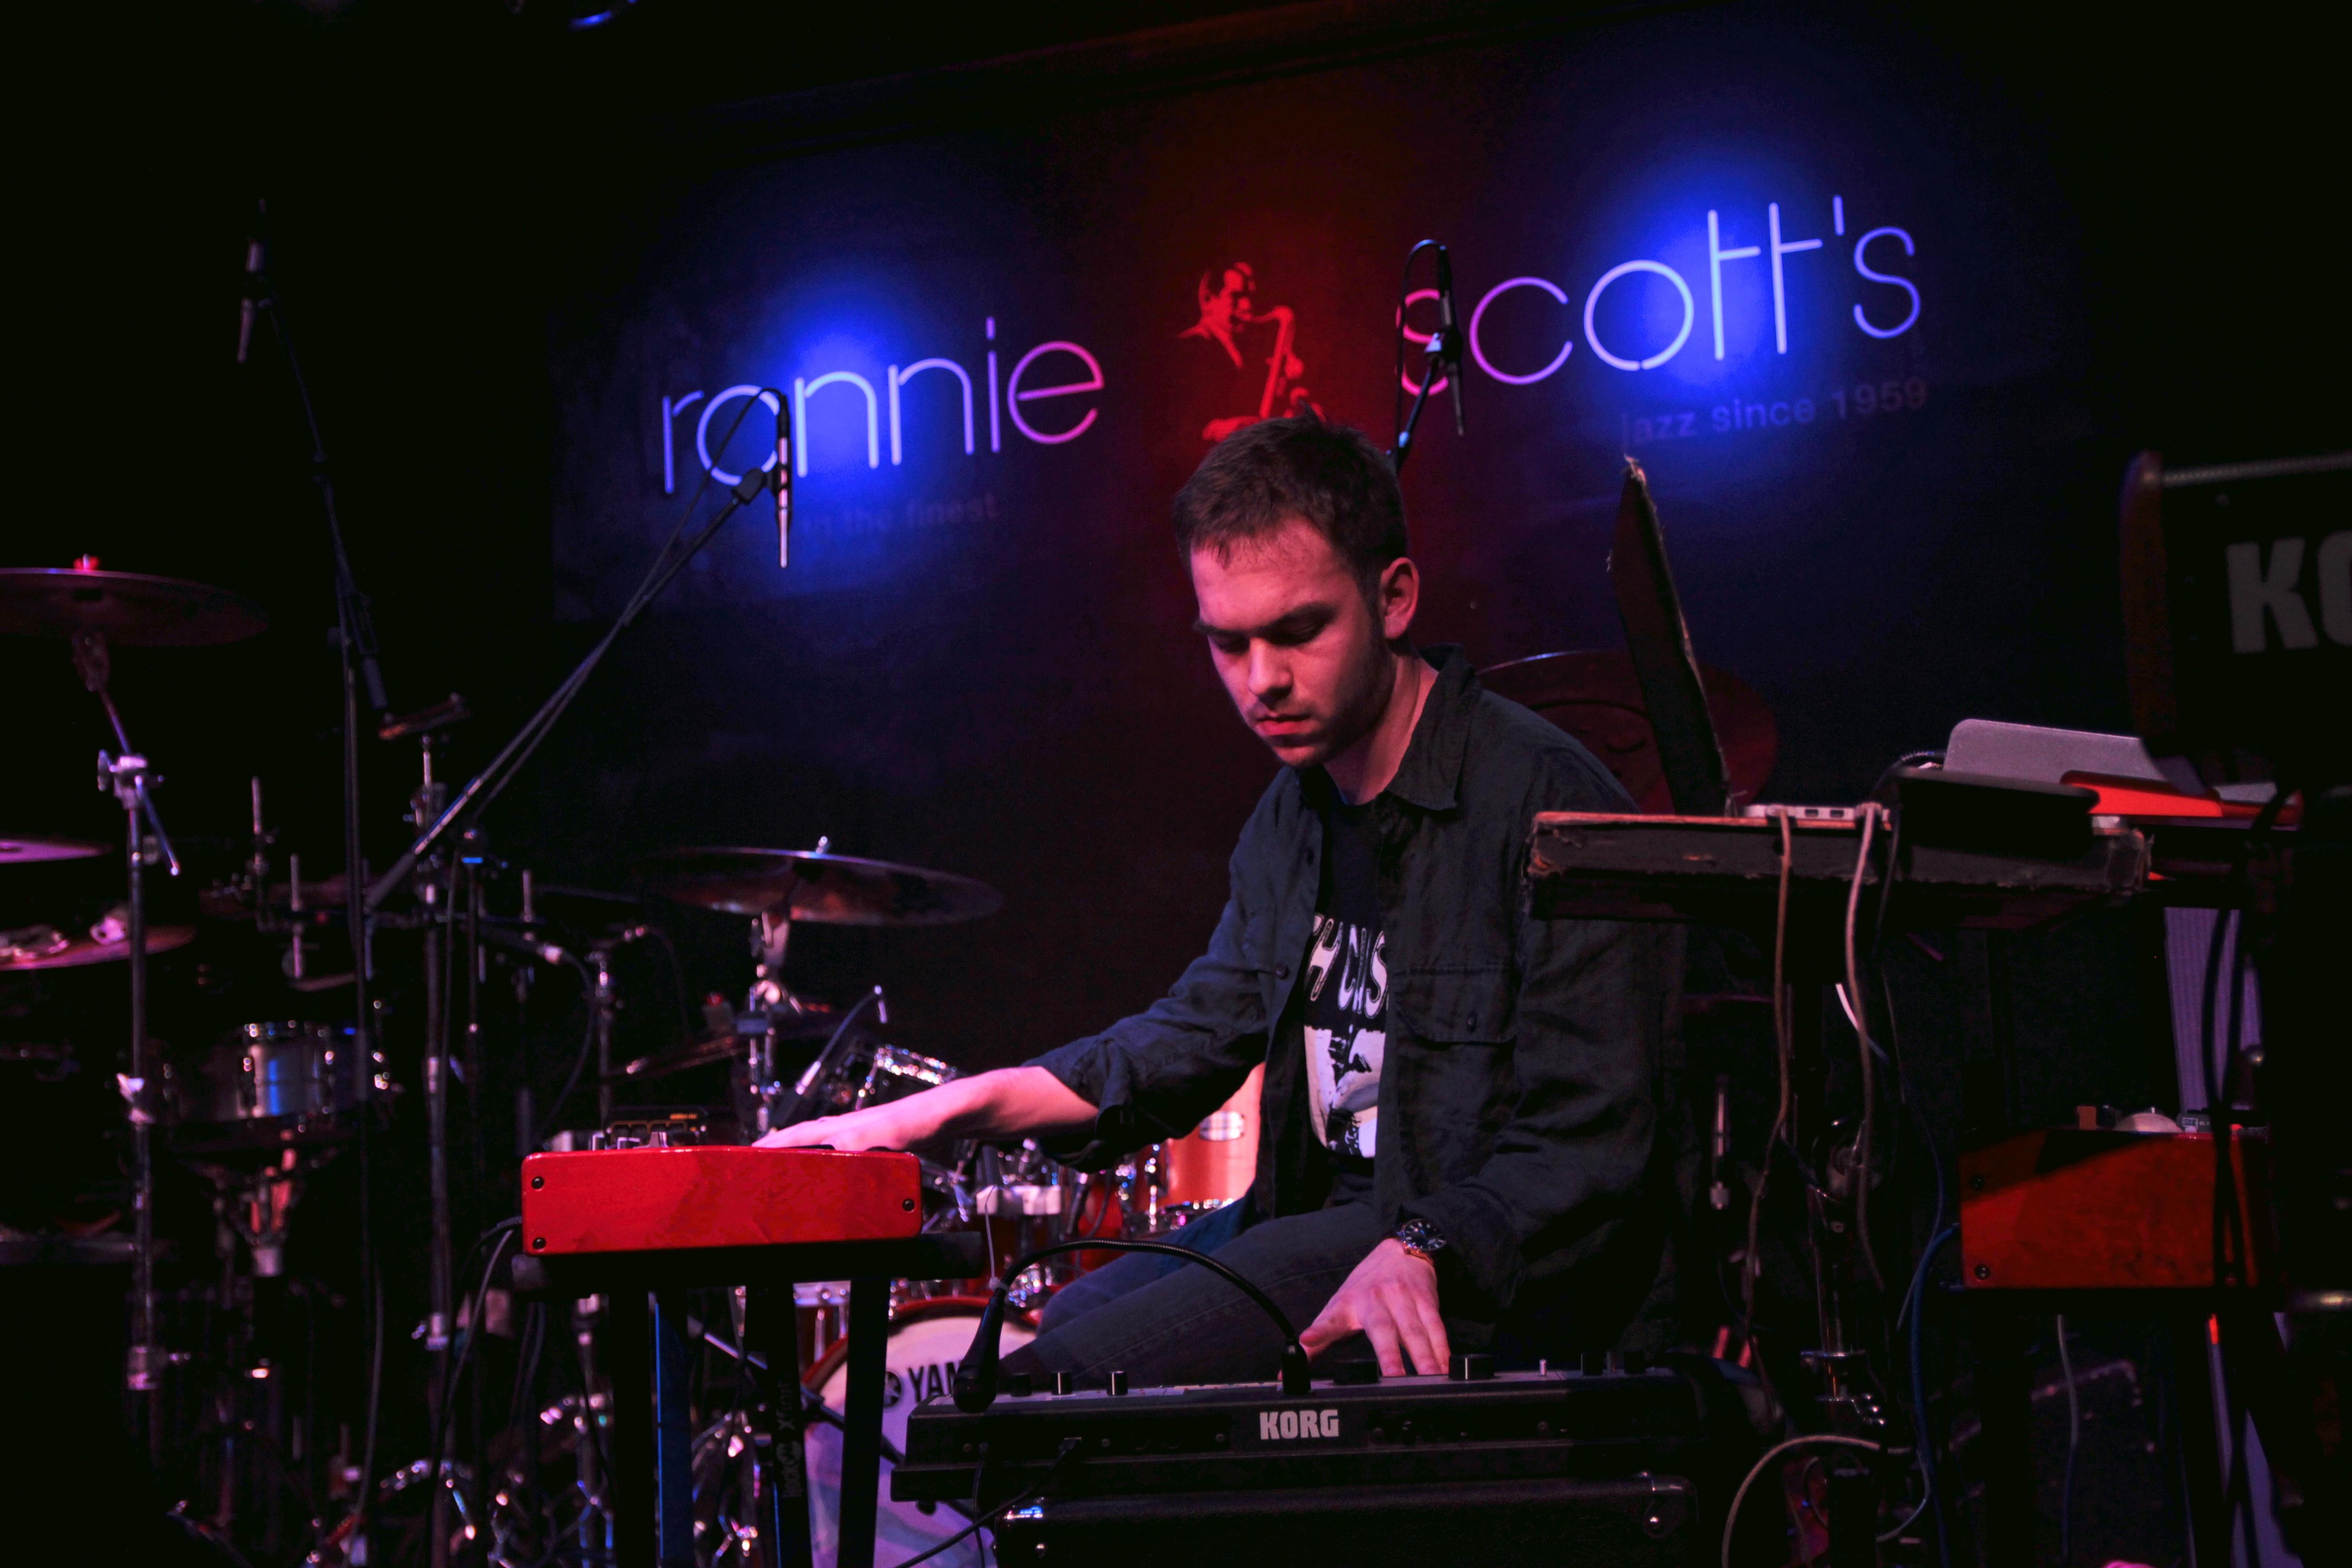 Zeñel @RonnieScotts